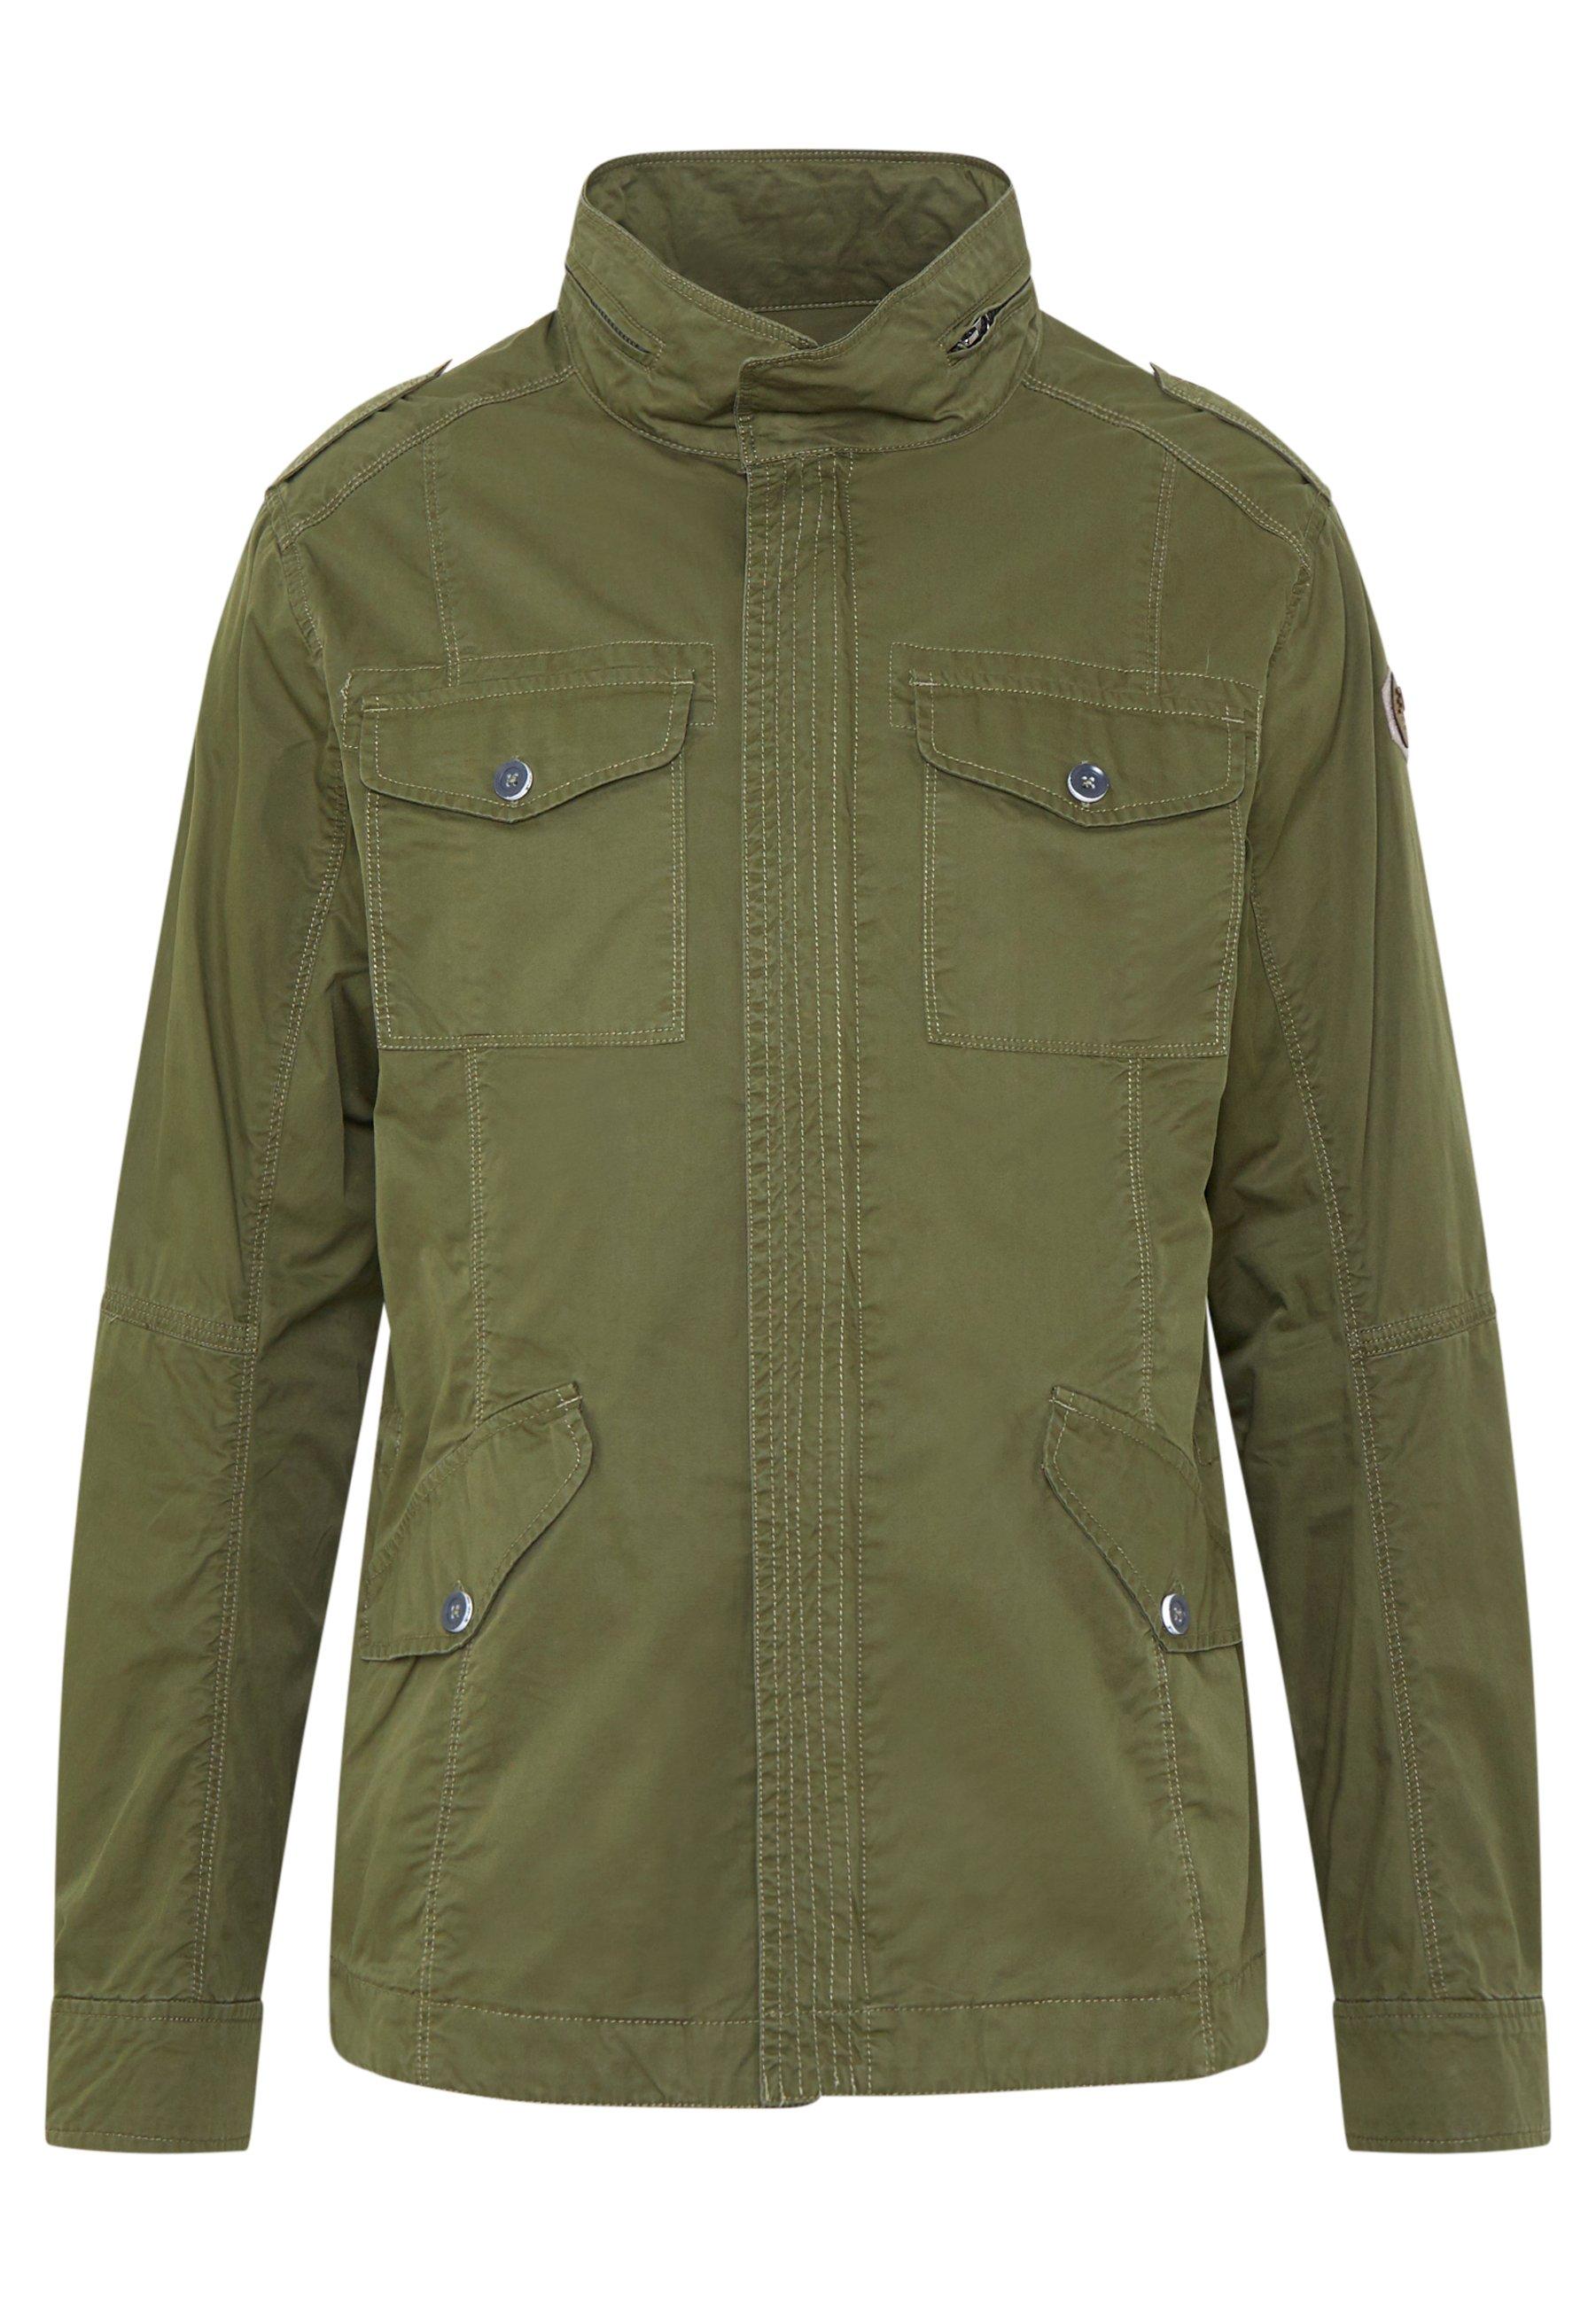 Icepeak Arimo - Outdoor Jacket Dark Olive UK